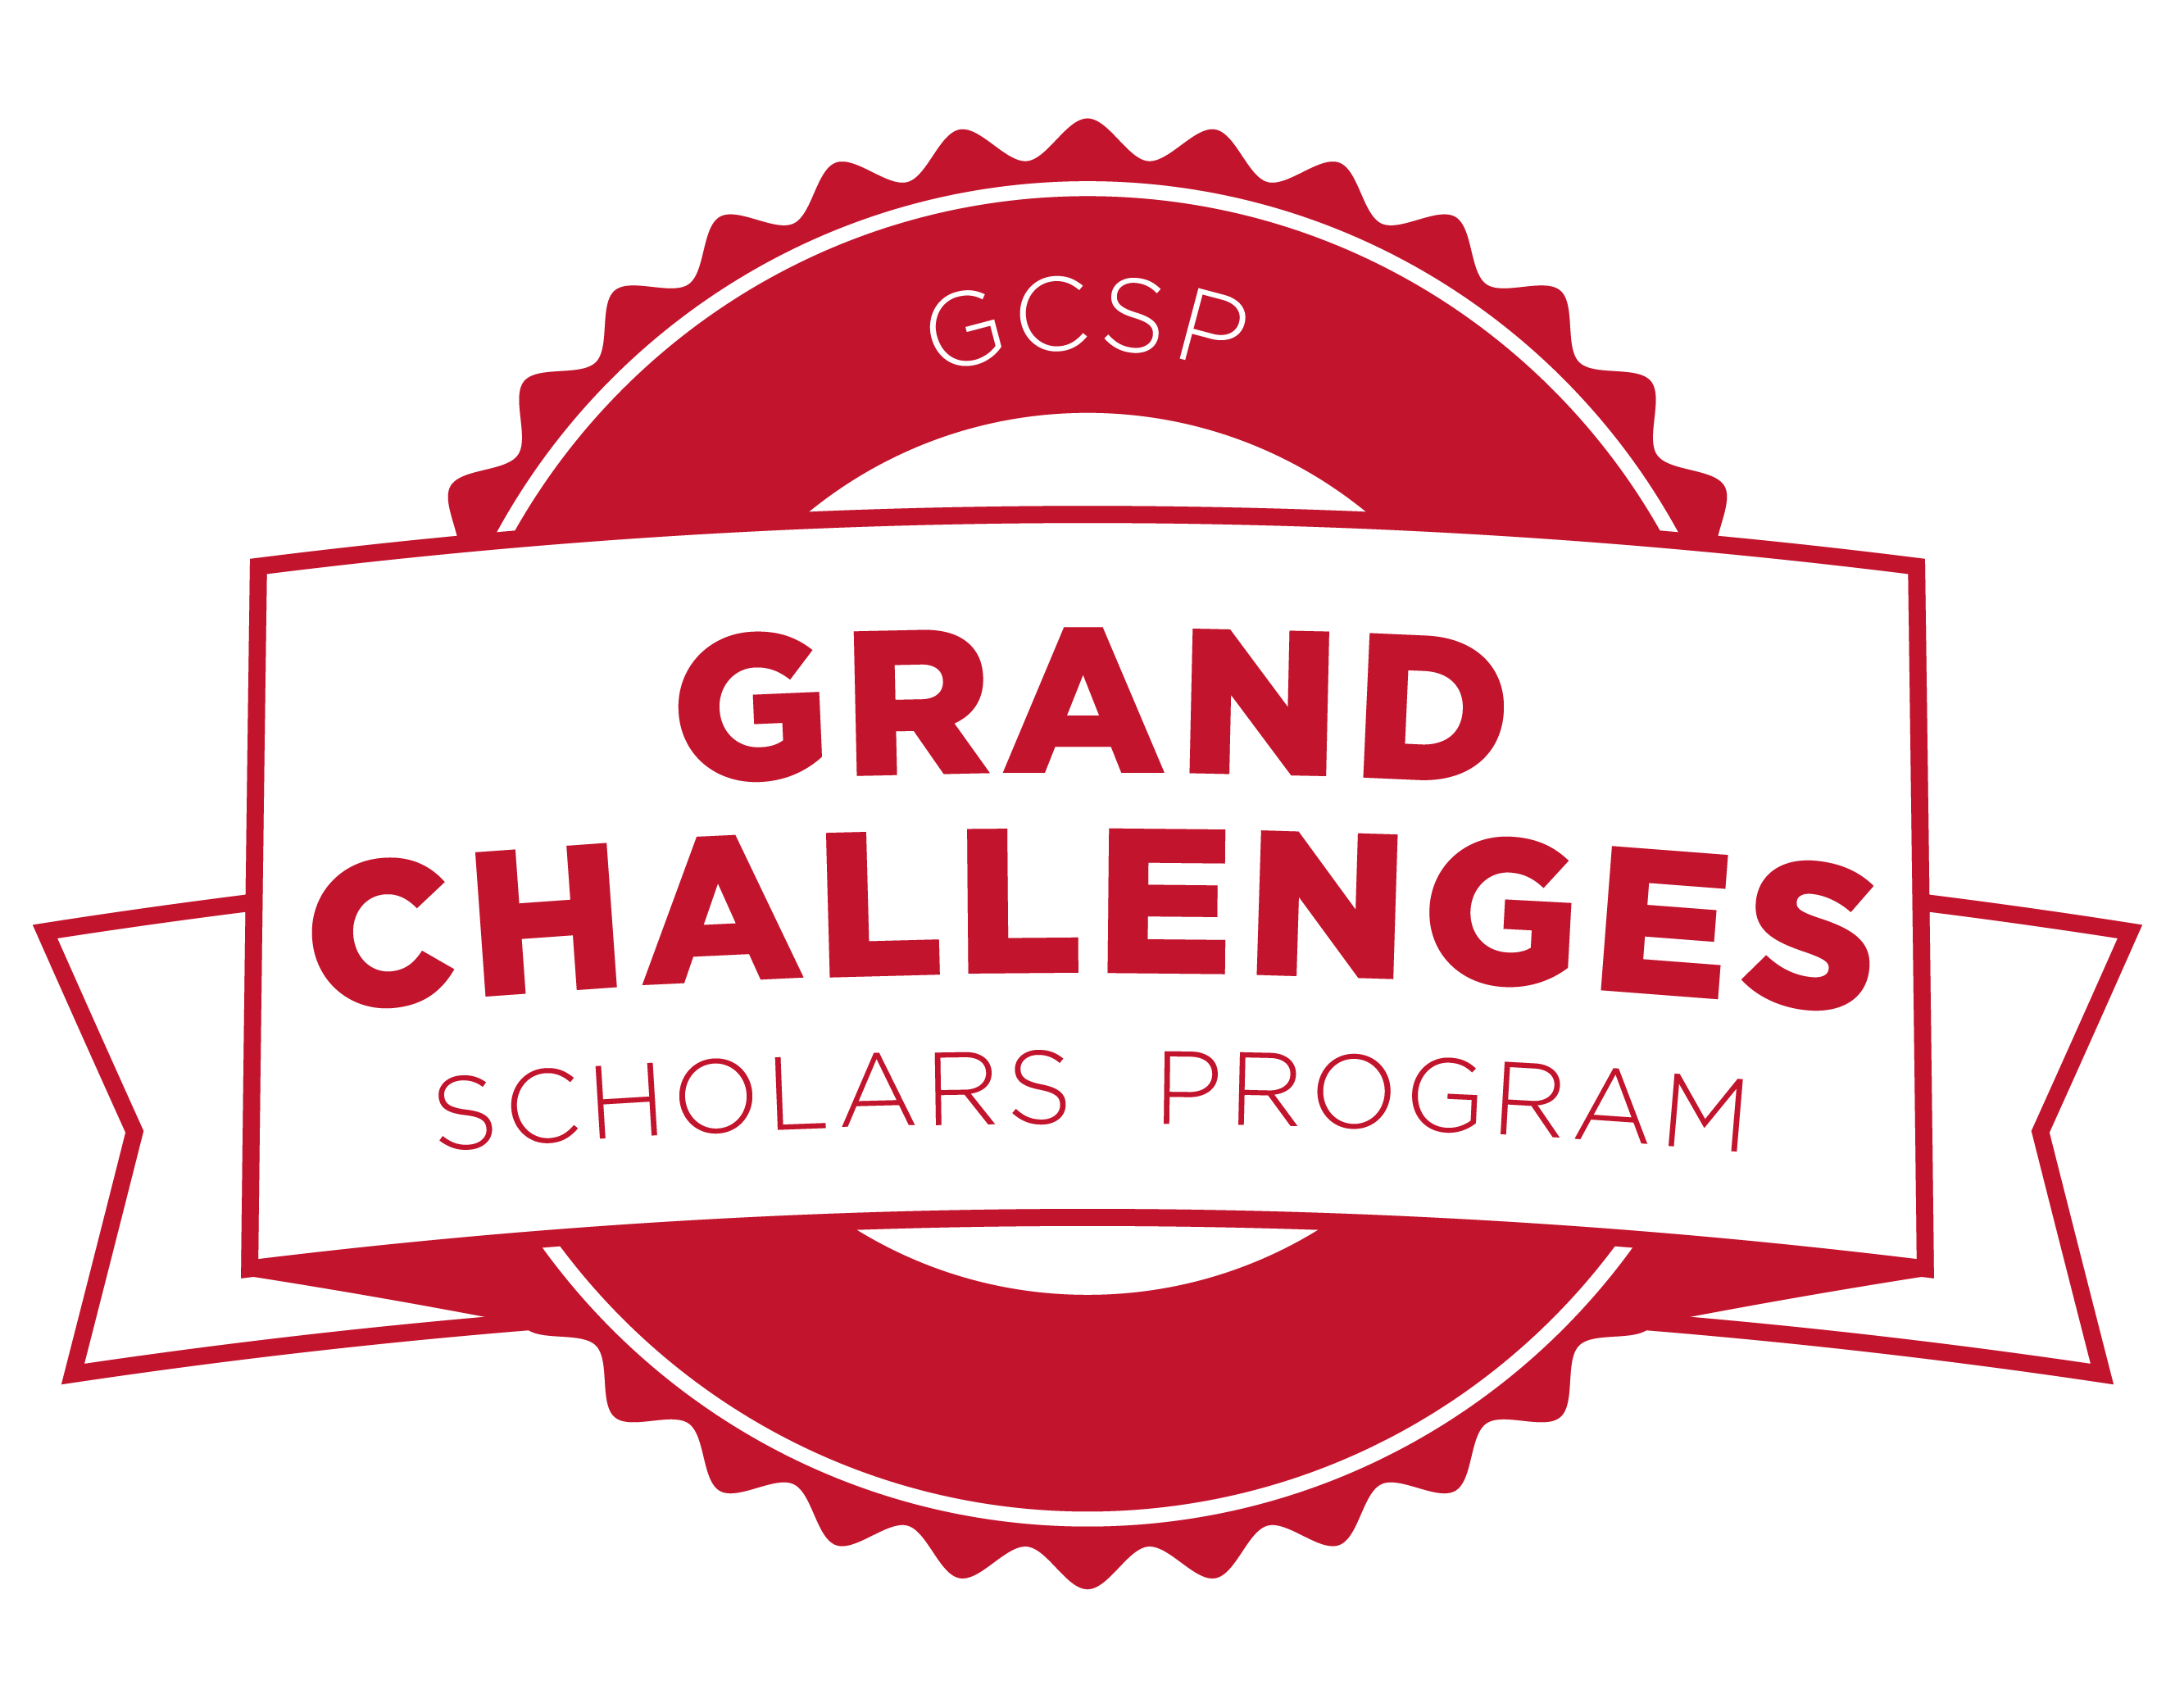 Grand Challenge Scholar Program